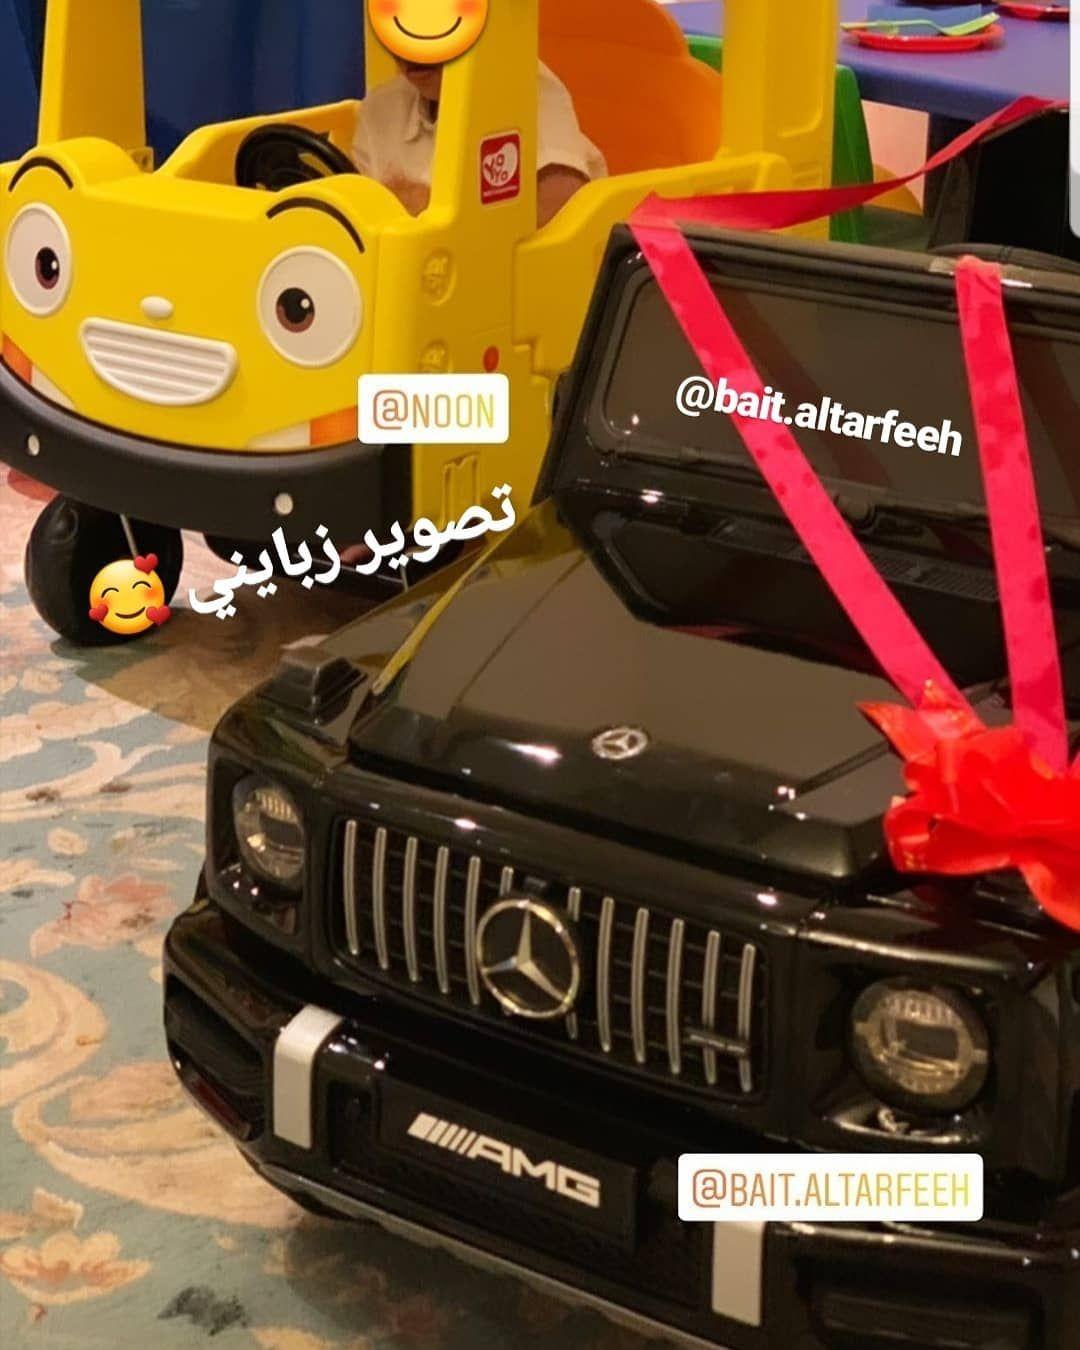 Mercedes Benz Mercedes Benz Benz Toy Car